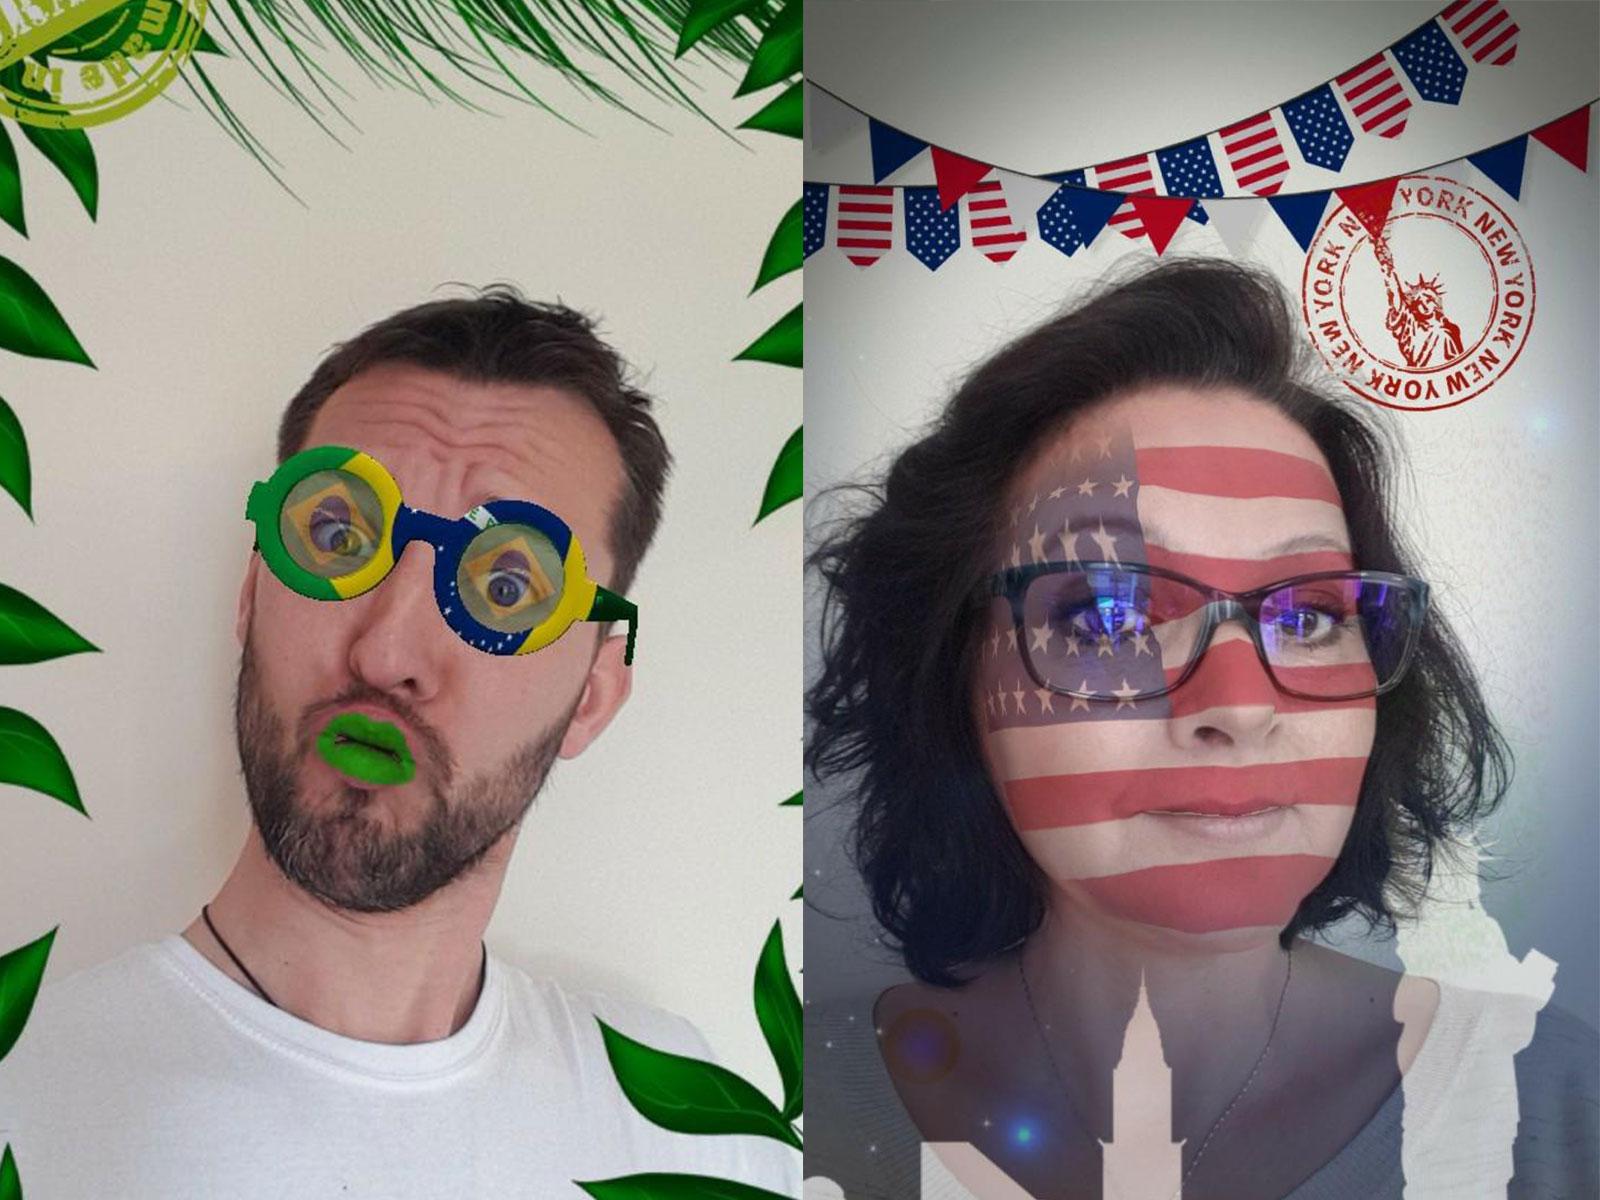 Création de vos filtres Snapchat et facebook En AR